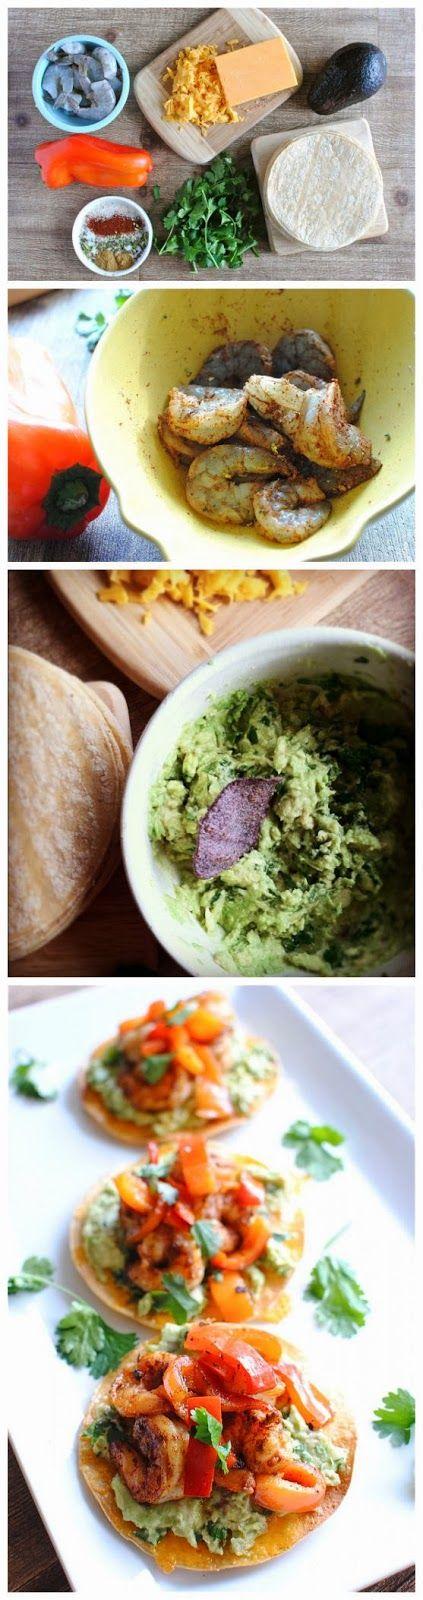 Simple Shrimp and Guacamole Tostadas | Recipes - mexican | Pinterest